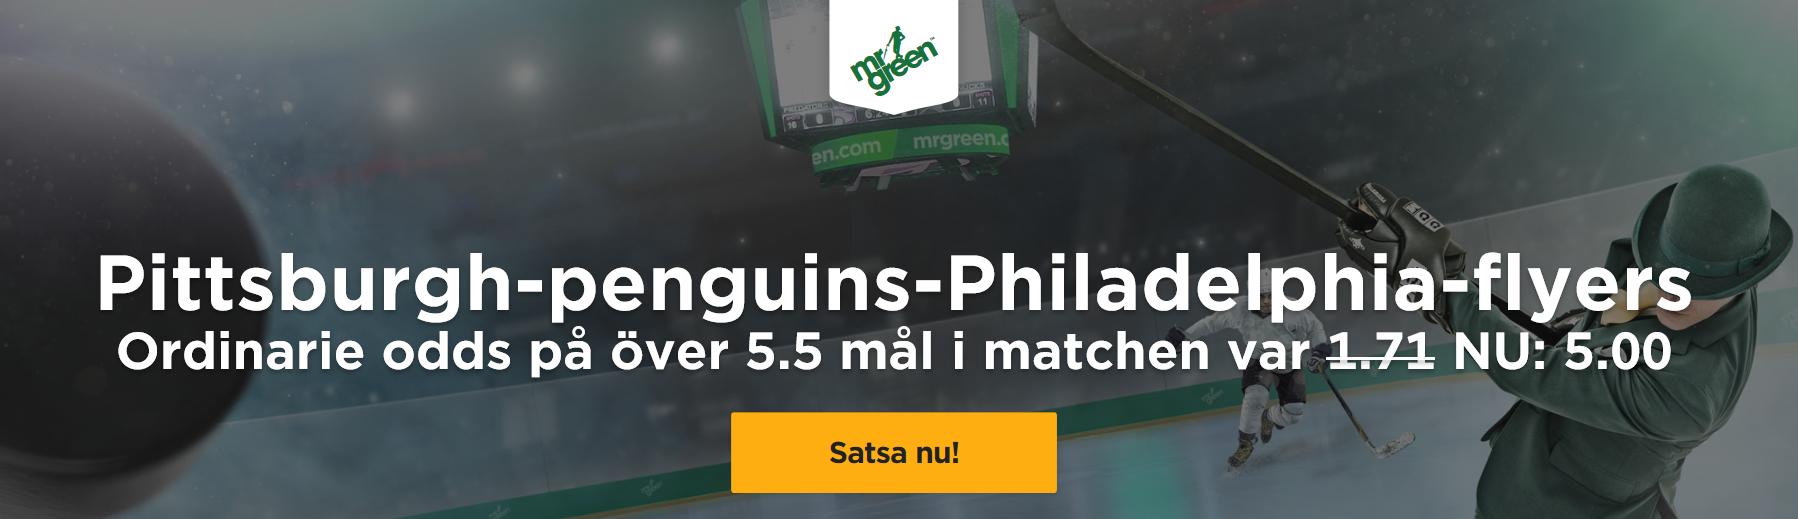 Exklusivt odds 5,00 på Pittsburgh Penguins – Philadelphia Flyers Ö5,5 mål